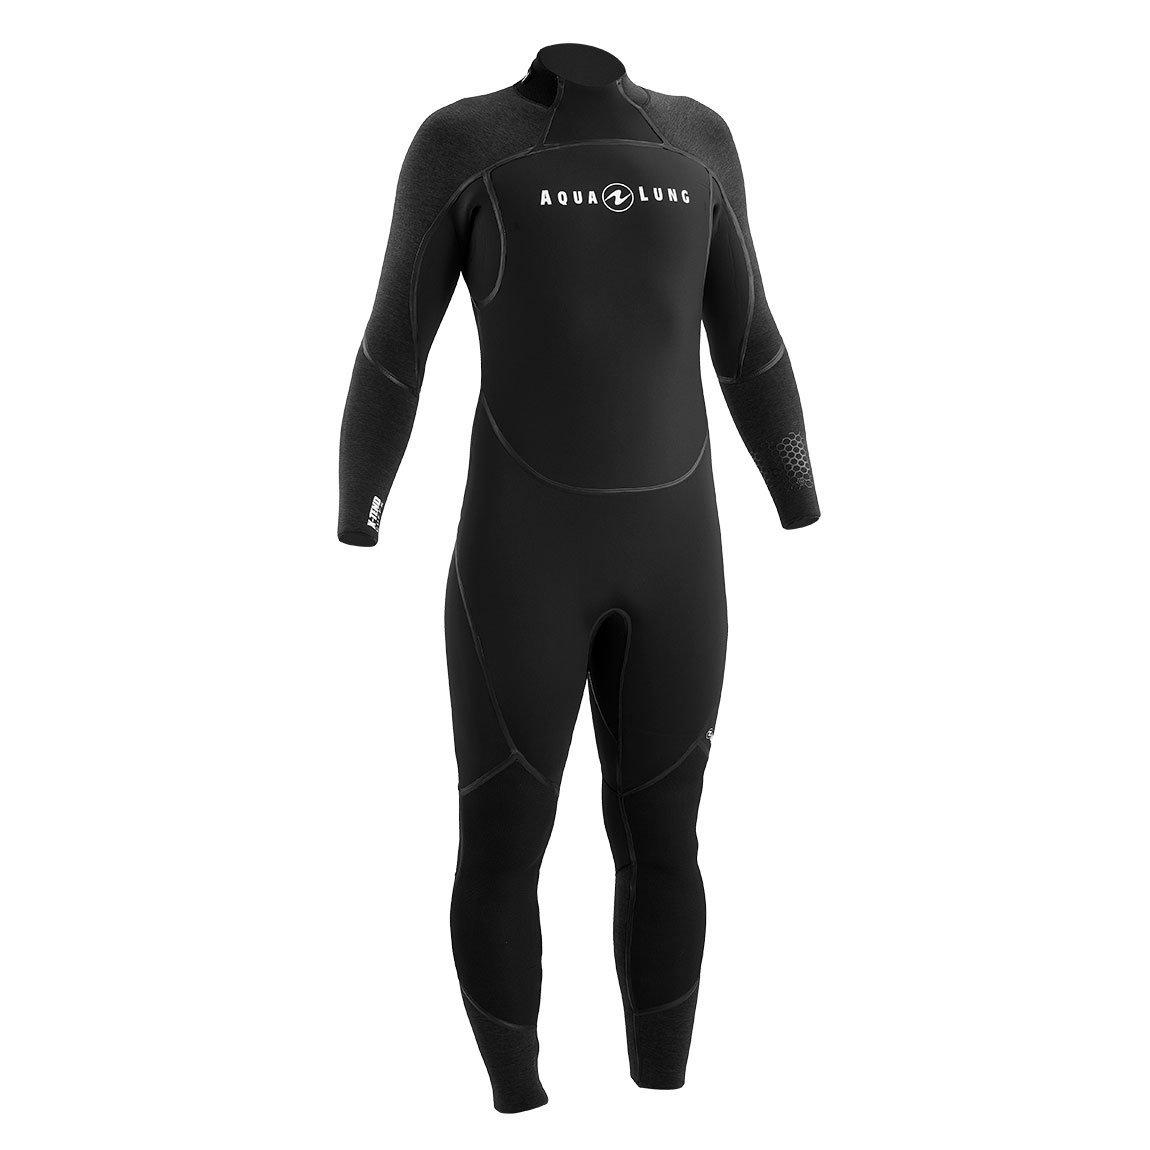 Wetsuit 7mm Aquaflex Men's Black/Charcoal